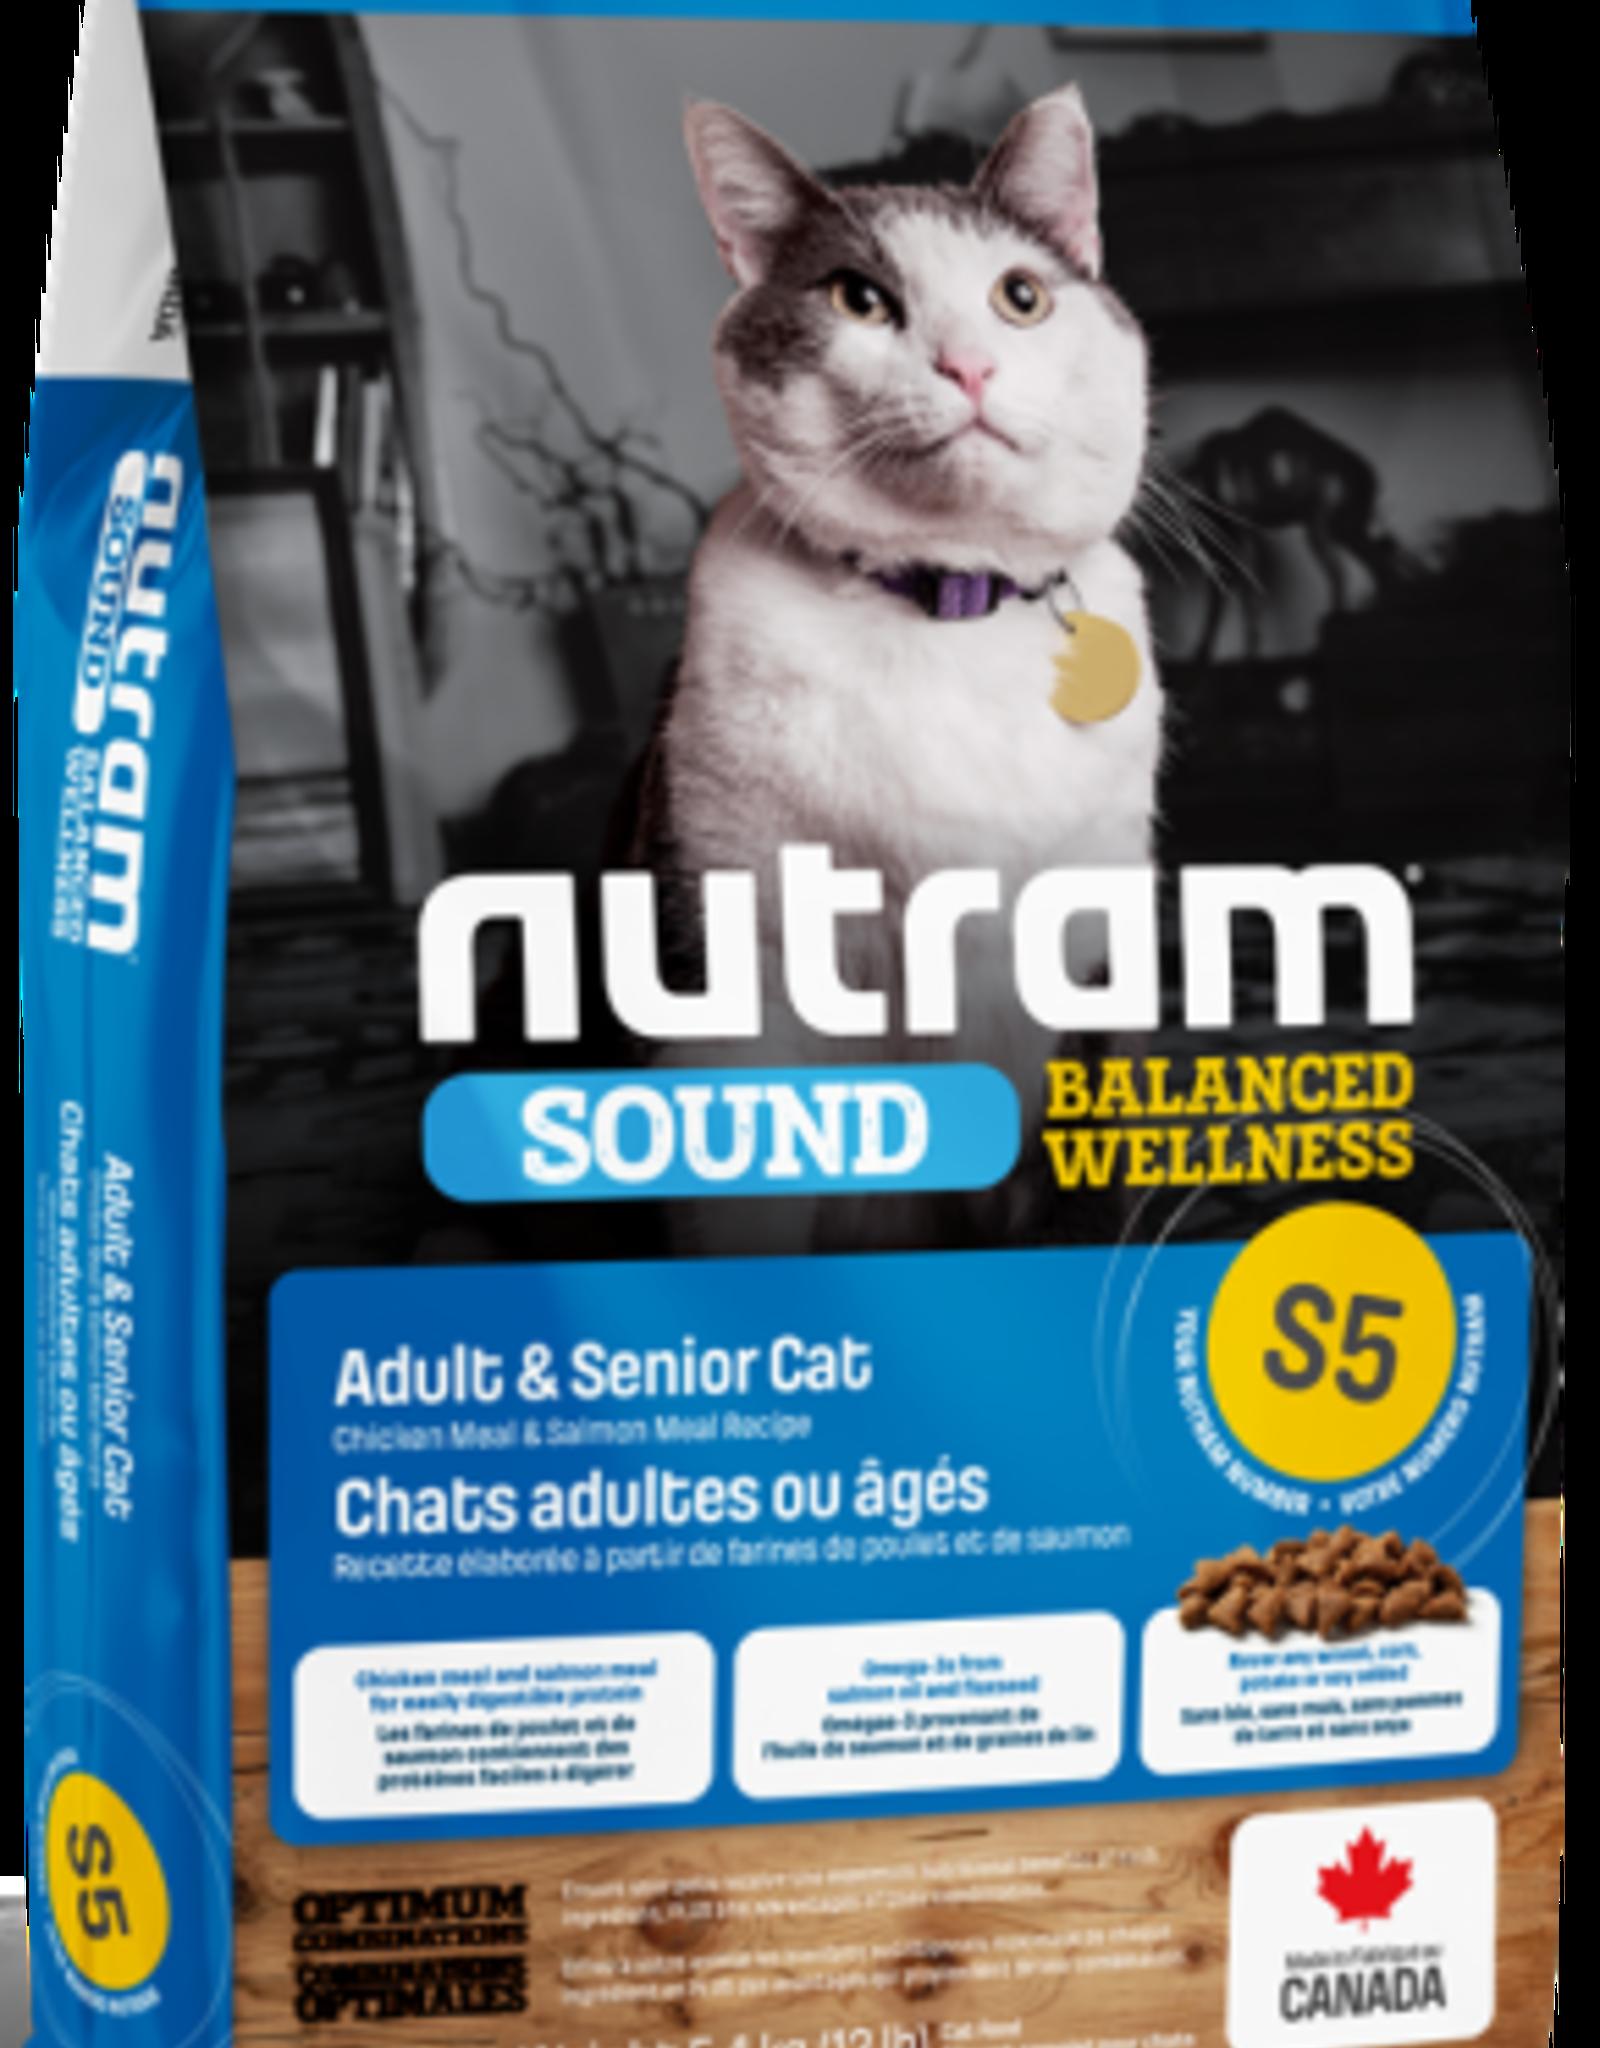 Nutram Nutram S5 Adult Cat 12 LB